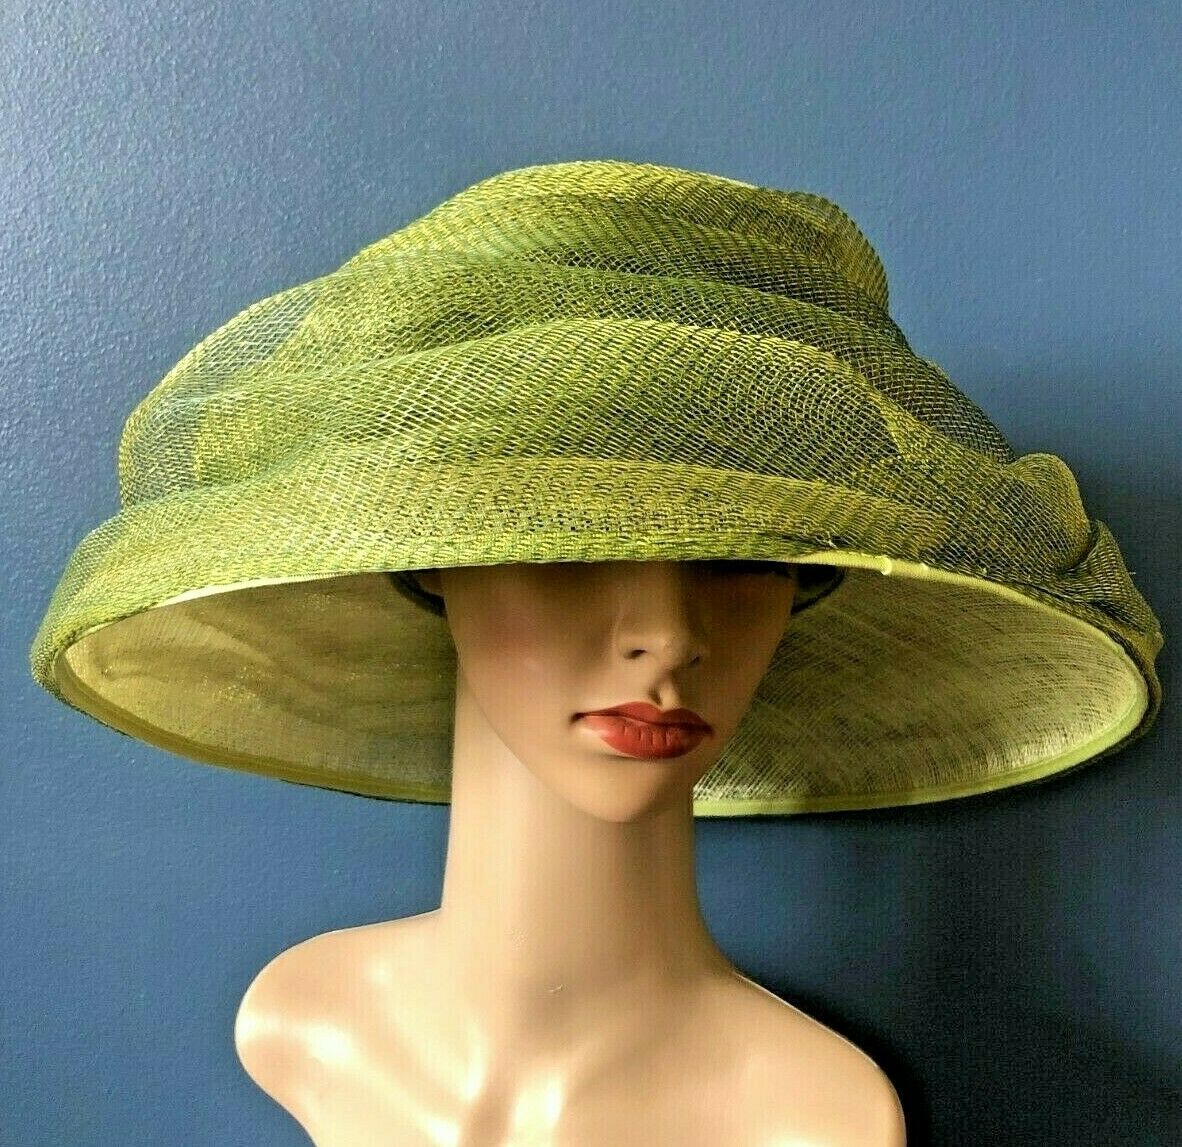 NEW Nigel Rayment Millinery Olive Green/Gold Mushroom Wedding Hat + Box